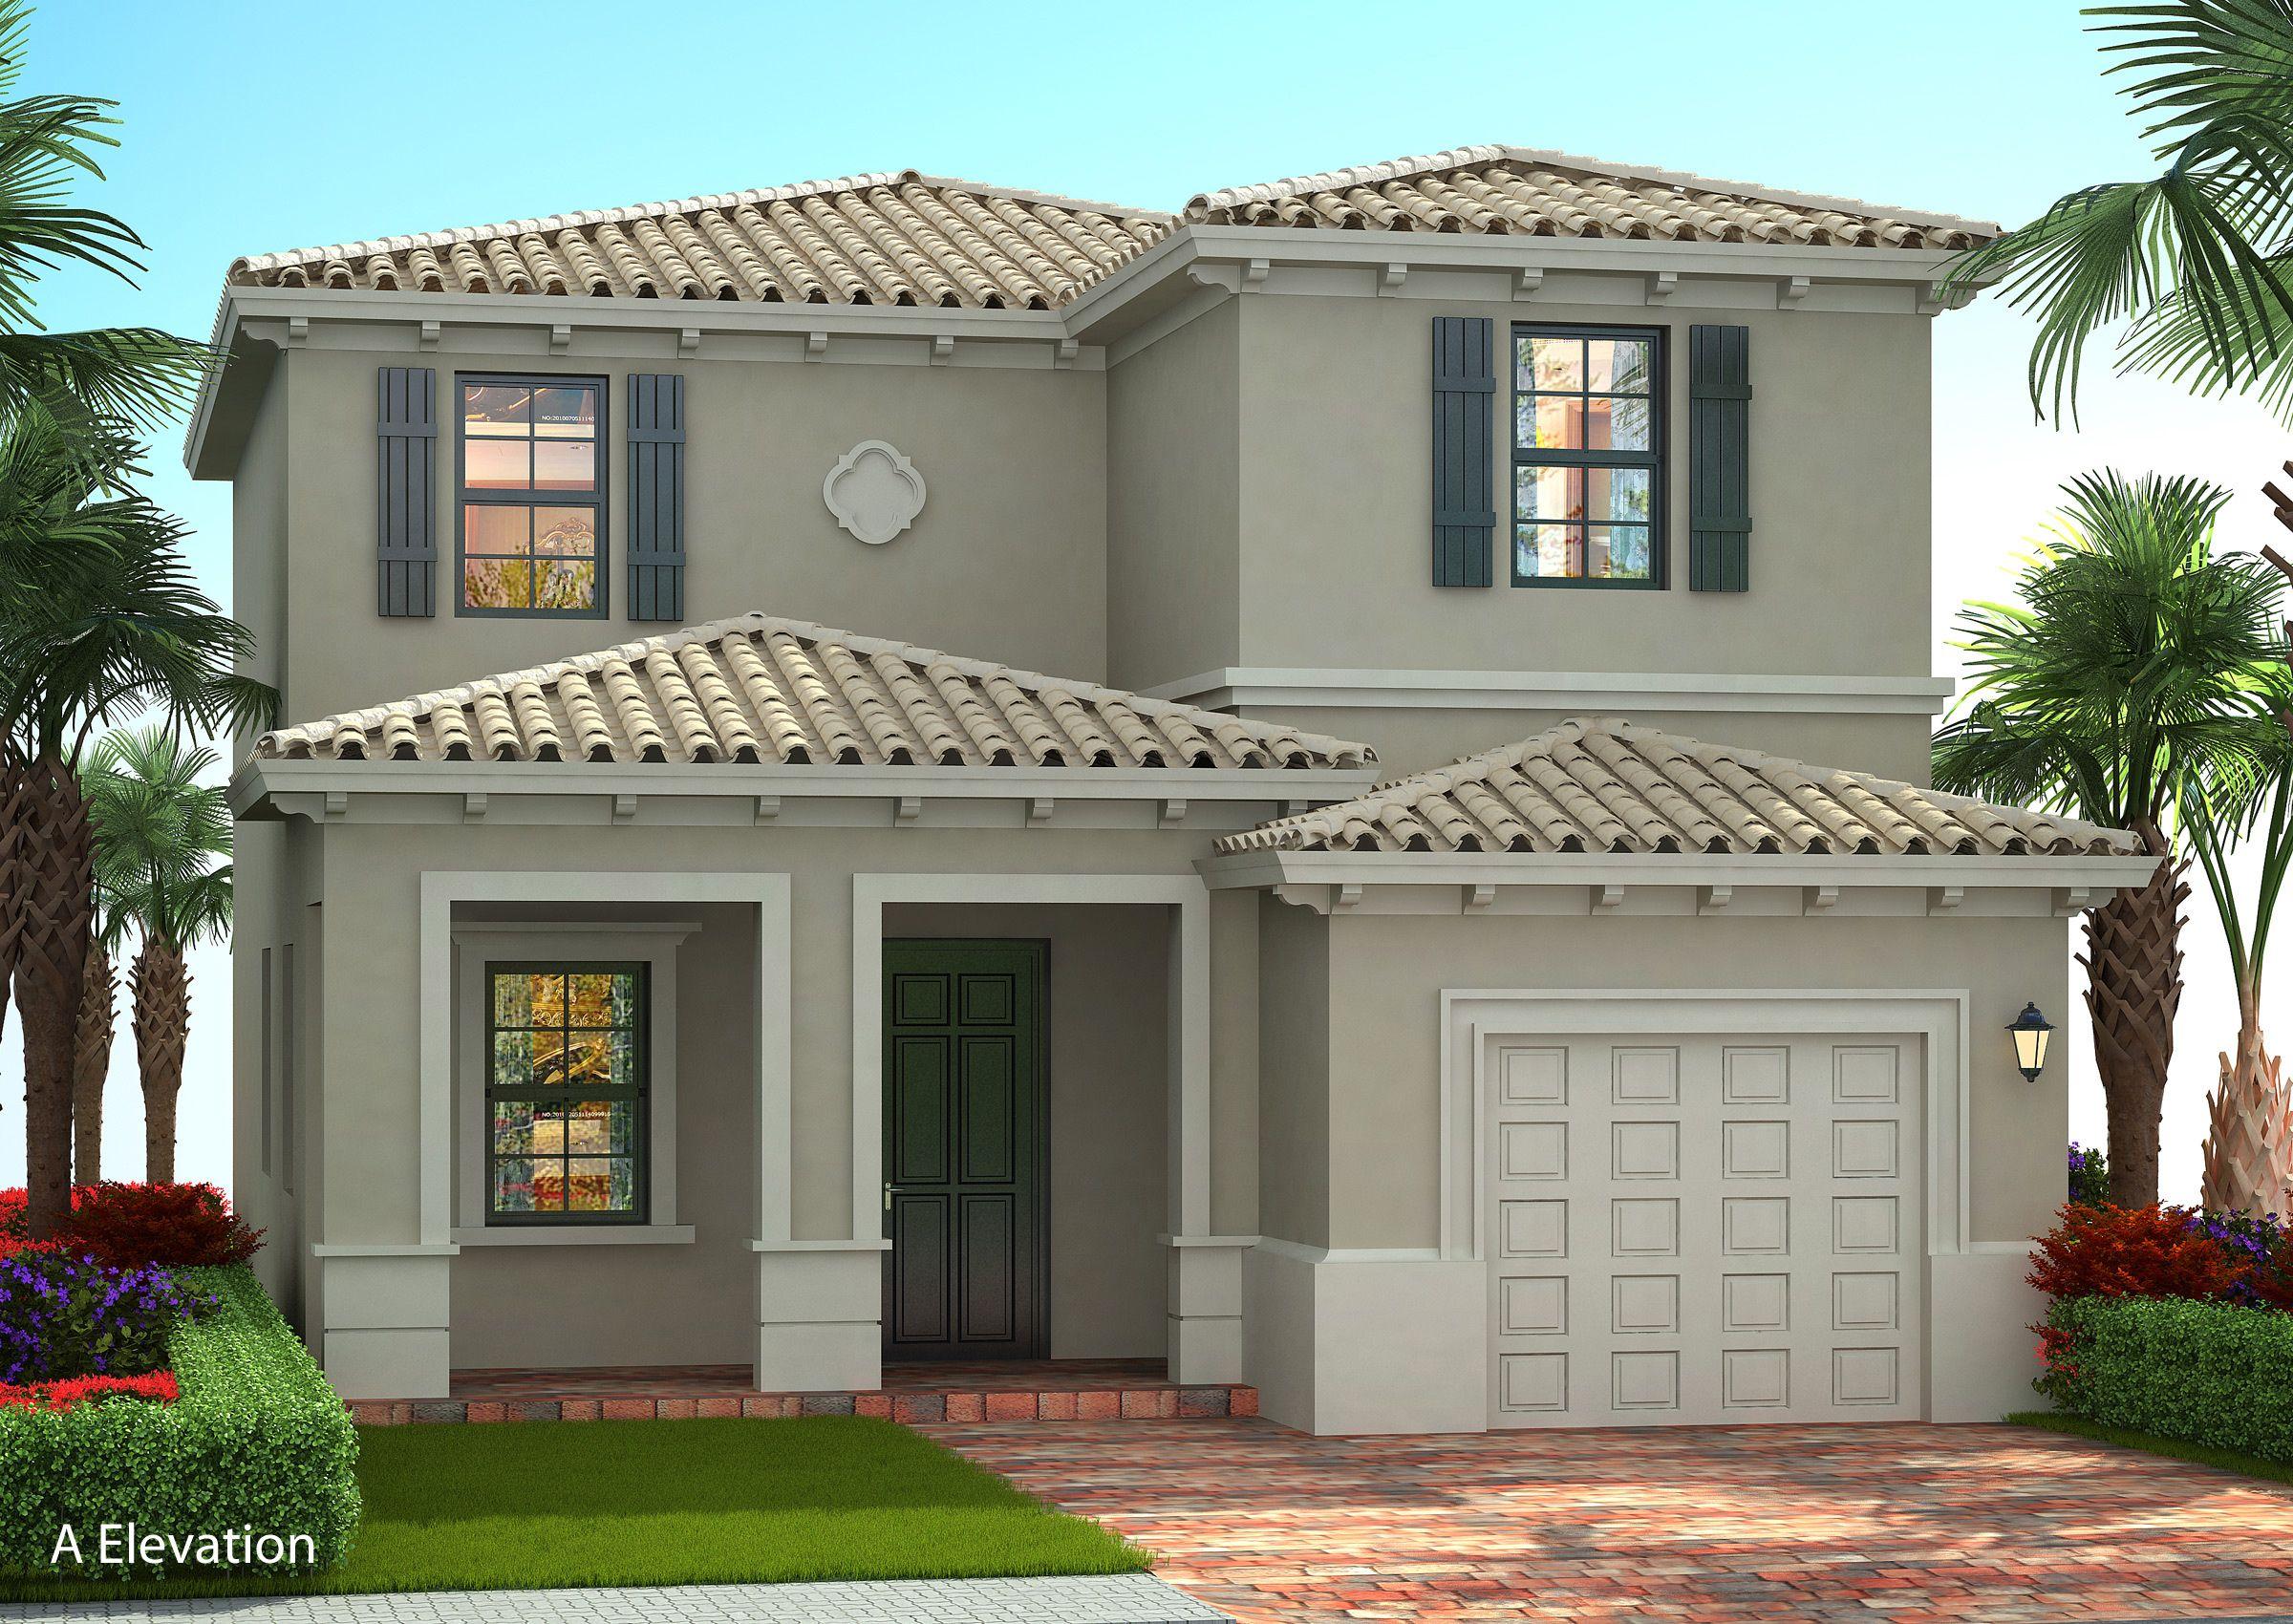 Our future home planos de la casa pinterest for Techos planos modernos